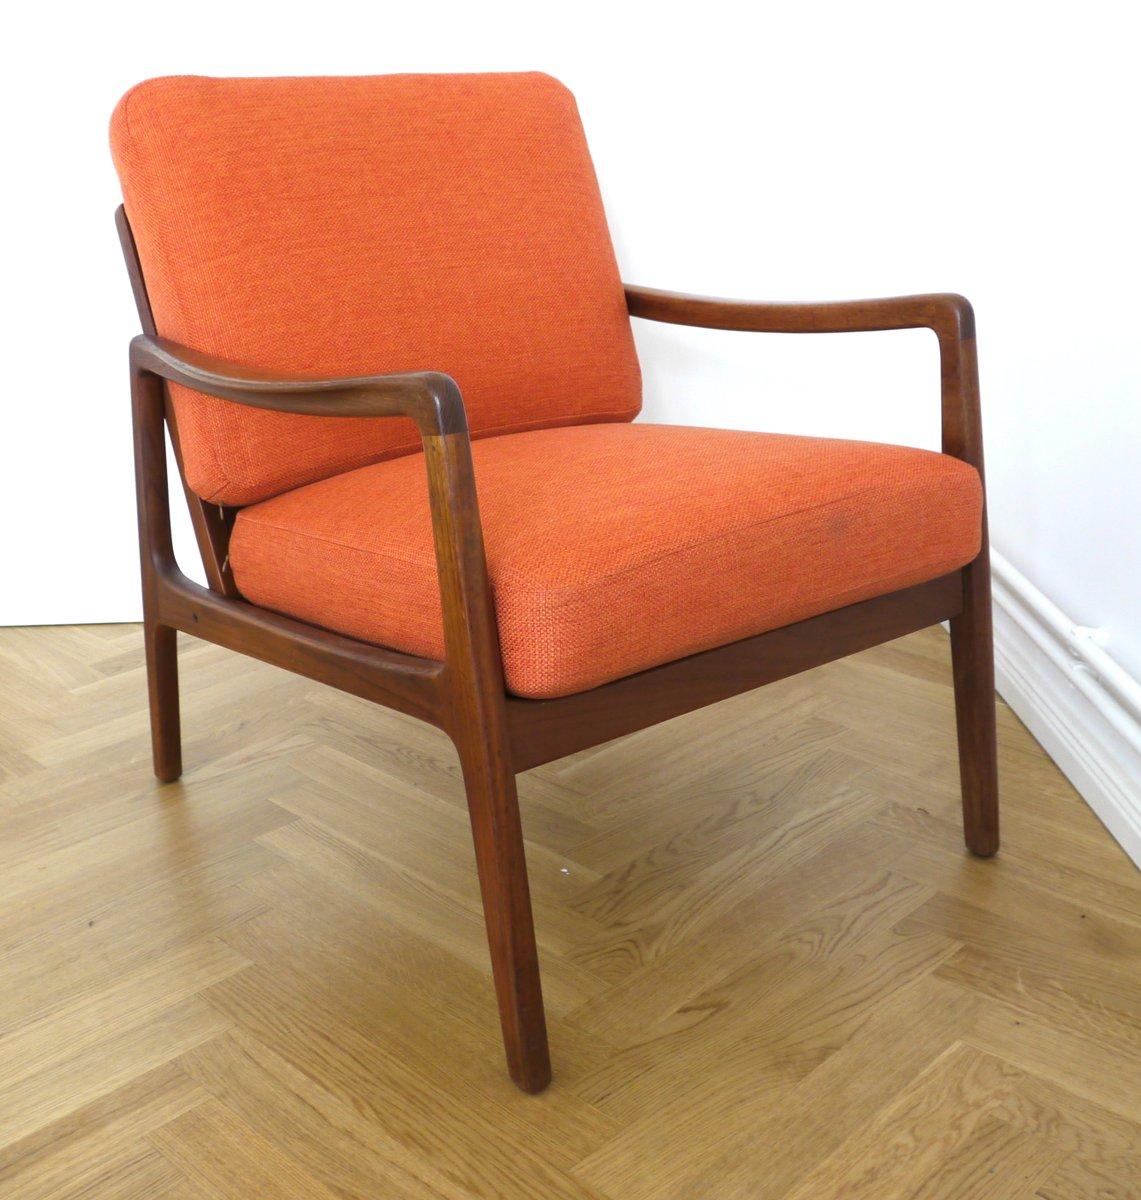 Mid Century FD109 Orange Teak Easy Lounge Chair By Ole Wanscher For France  U0026 Søn